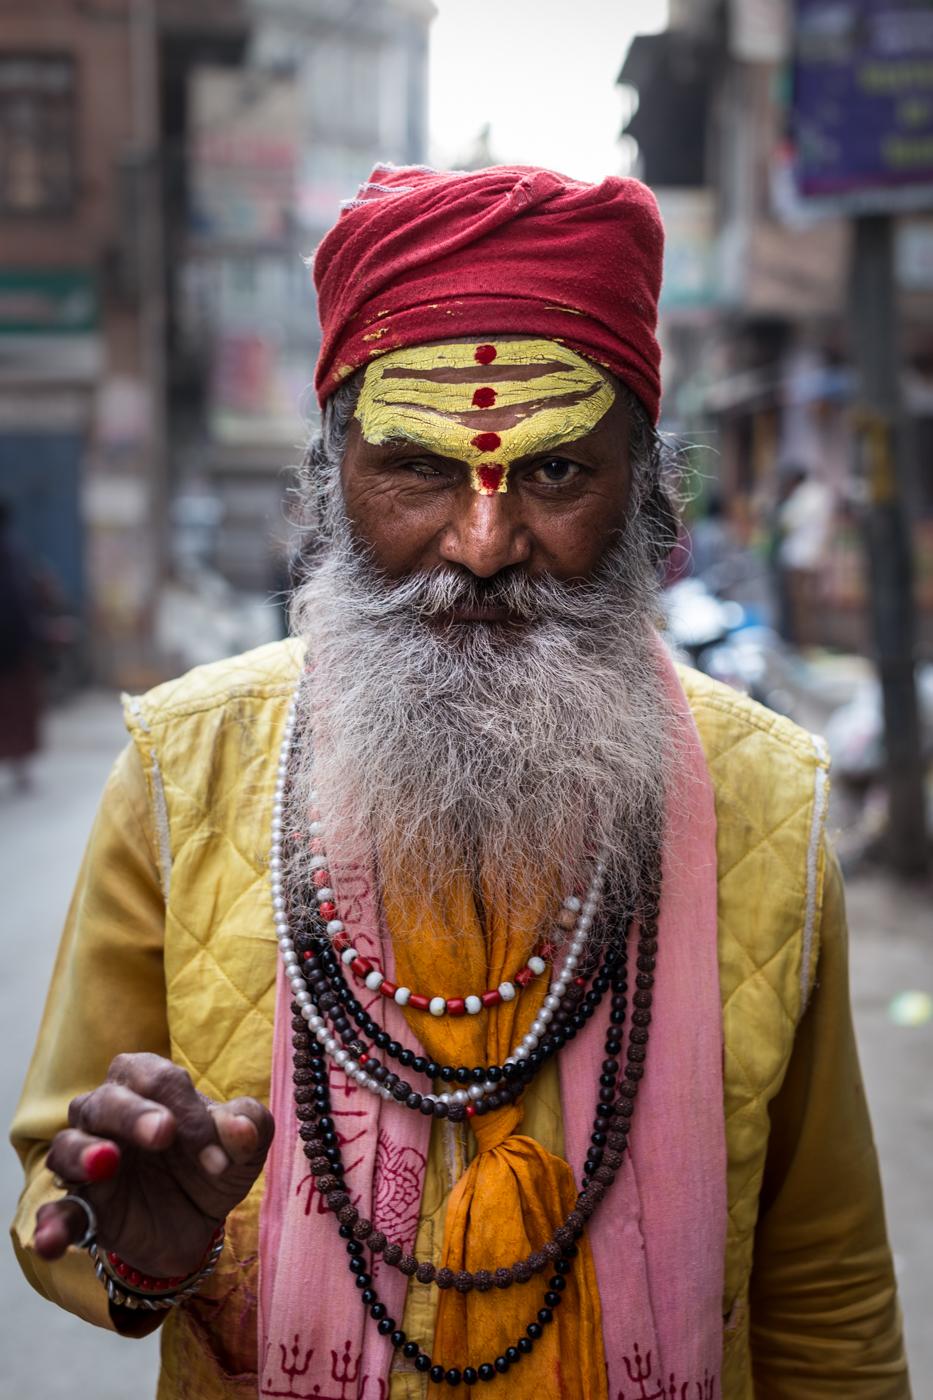 Spent an early morning walking around this Sadu's neighbourhood & exchanging a few words.